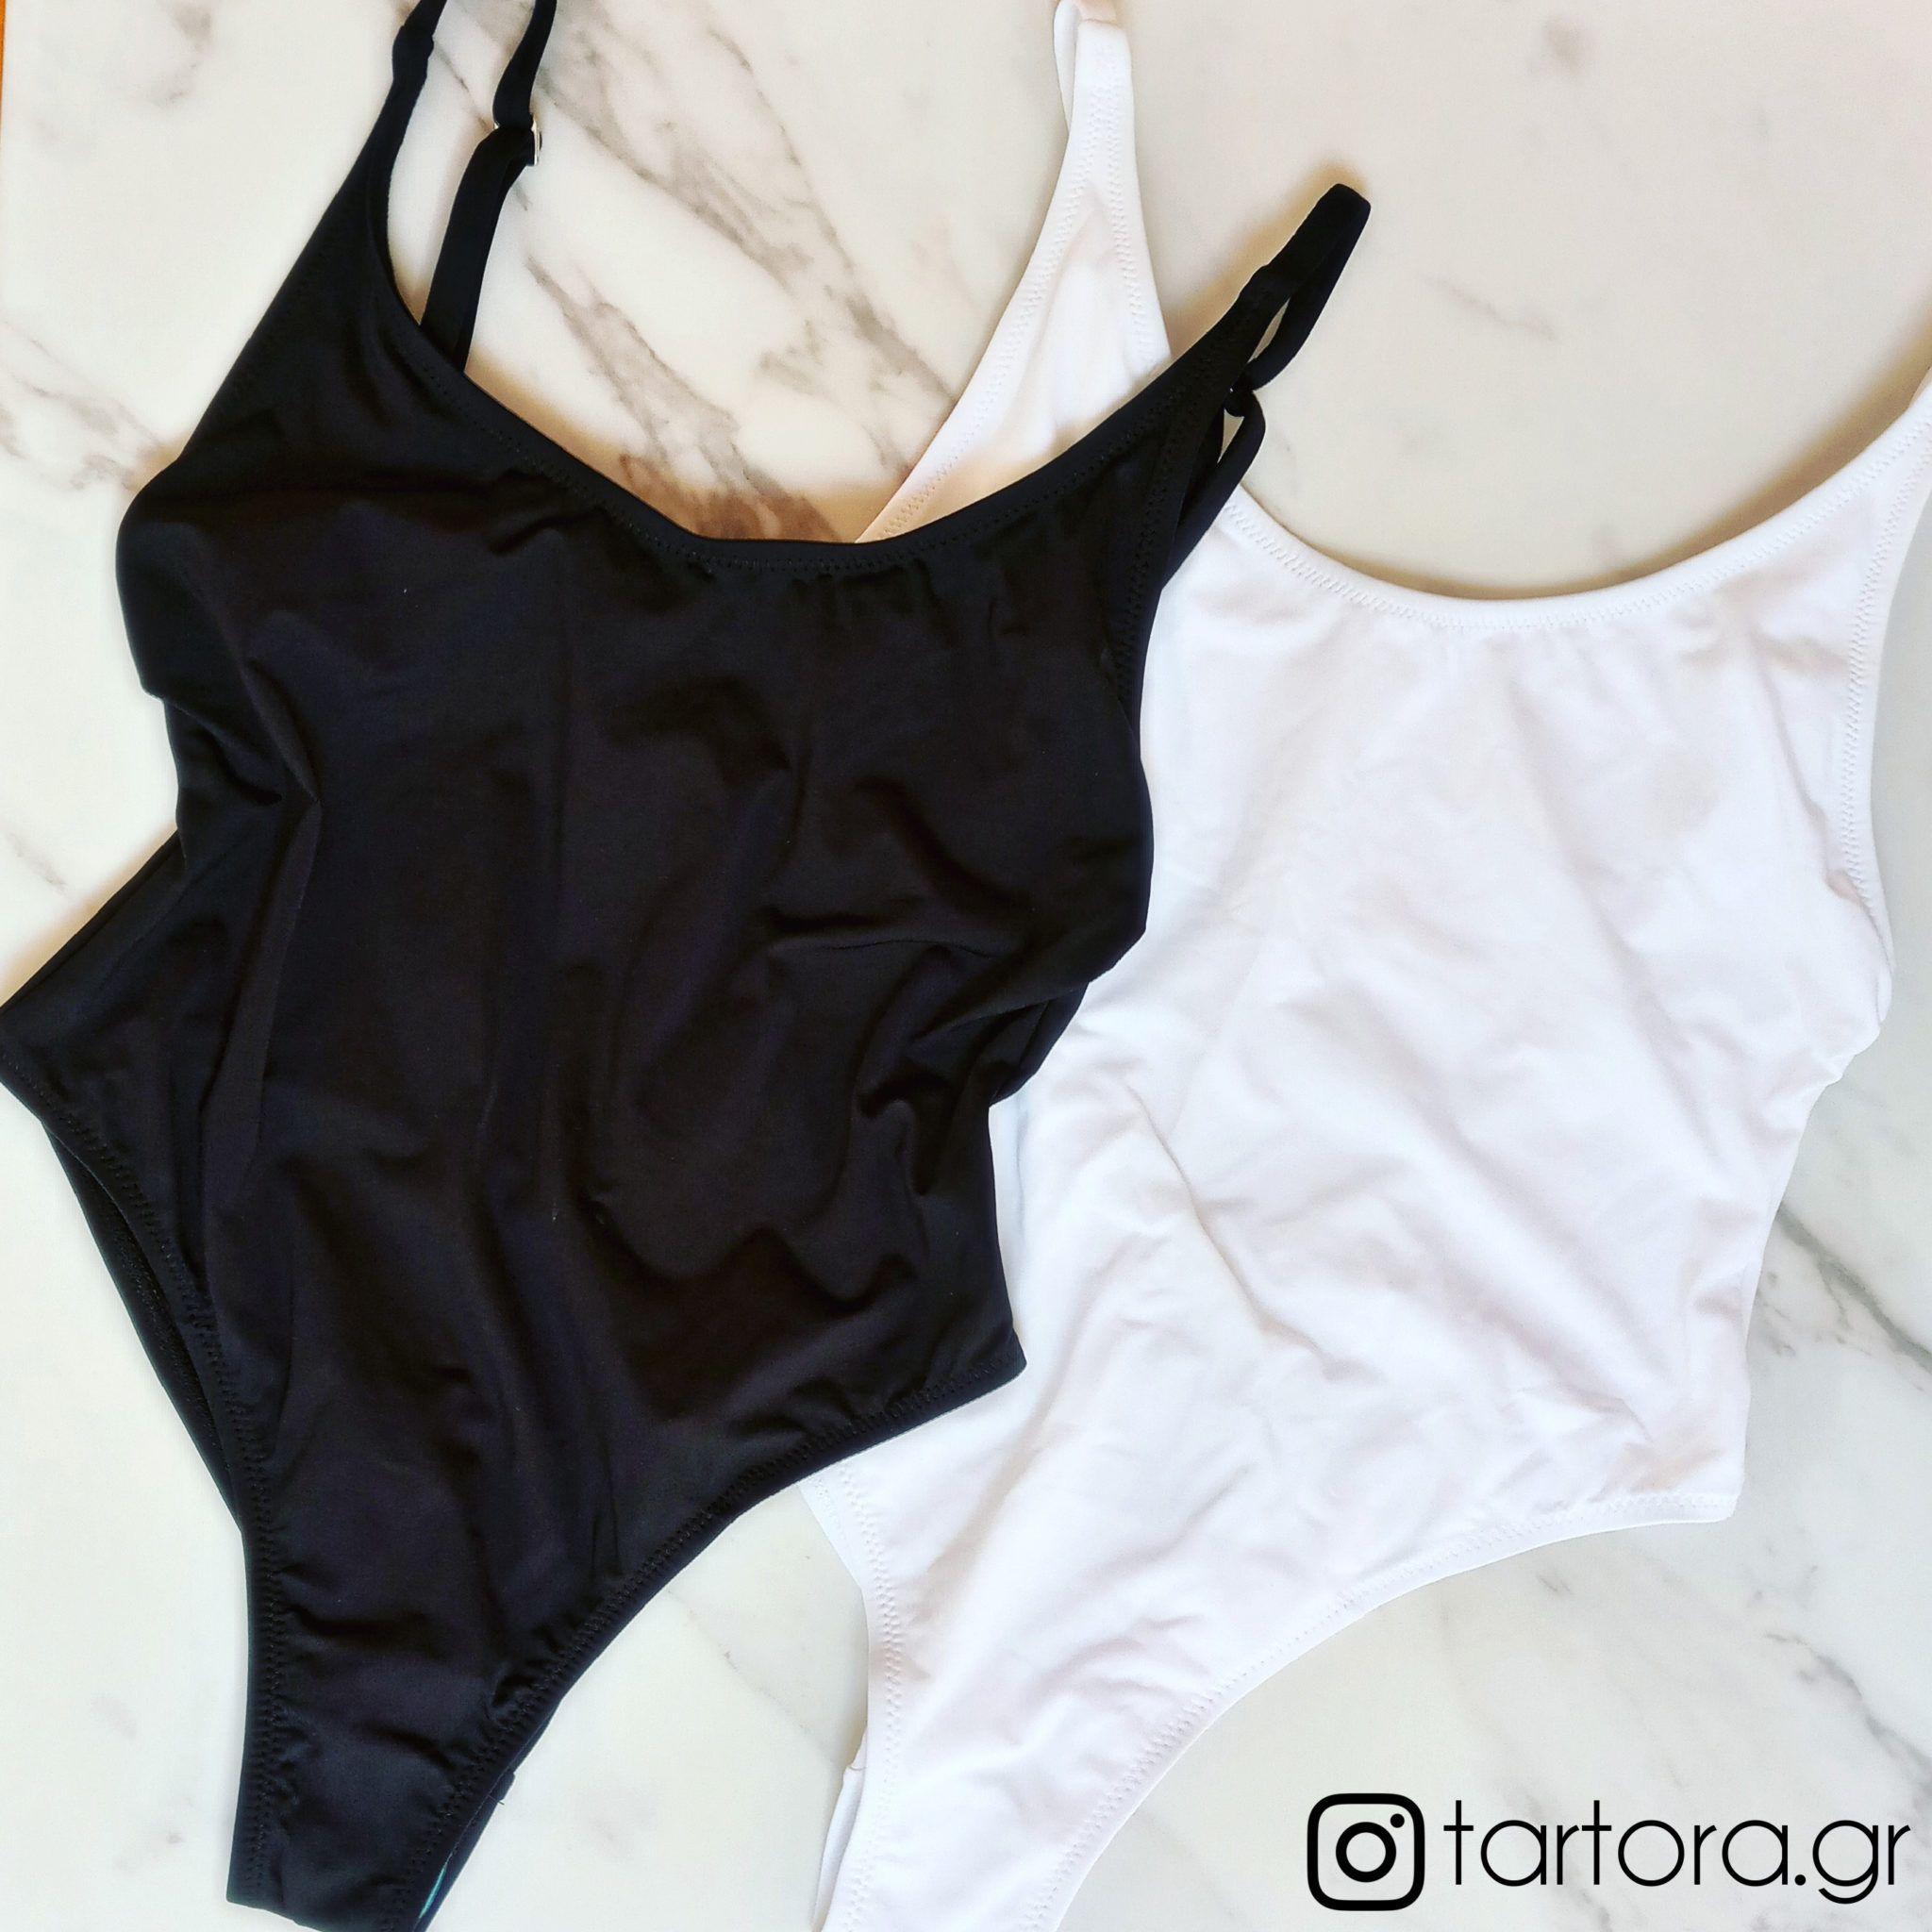 790f64c22b2 Erka Μαγιό Ολόσωμο Μαύρο 7765921 – Tartora.gr | ERKA mare | Swimwear ...